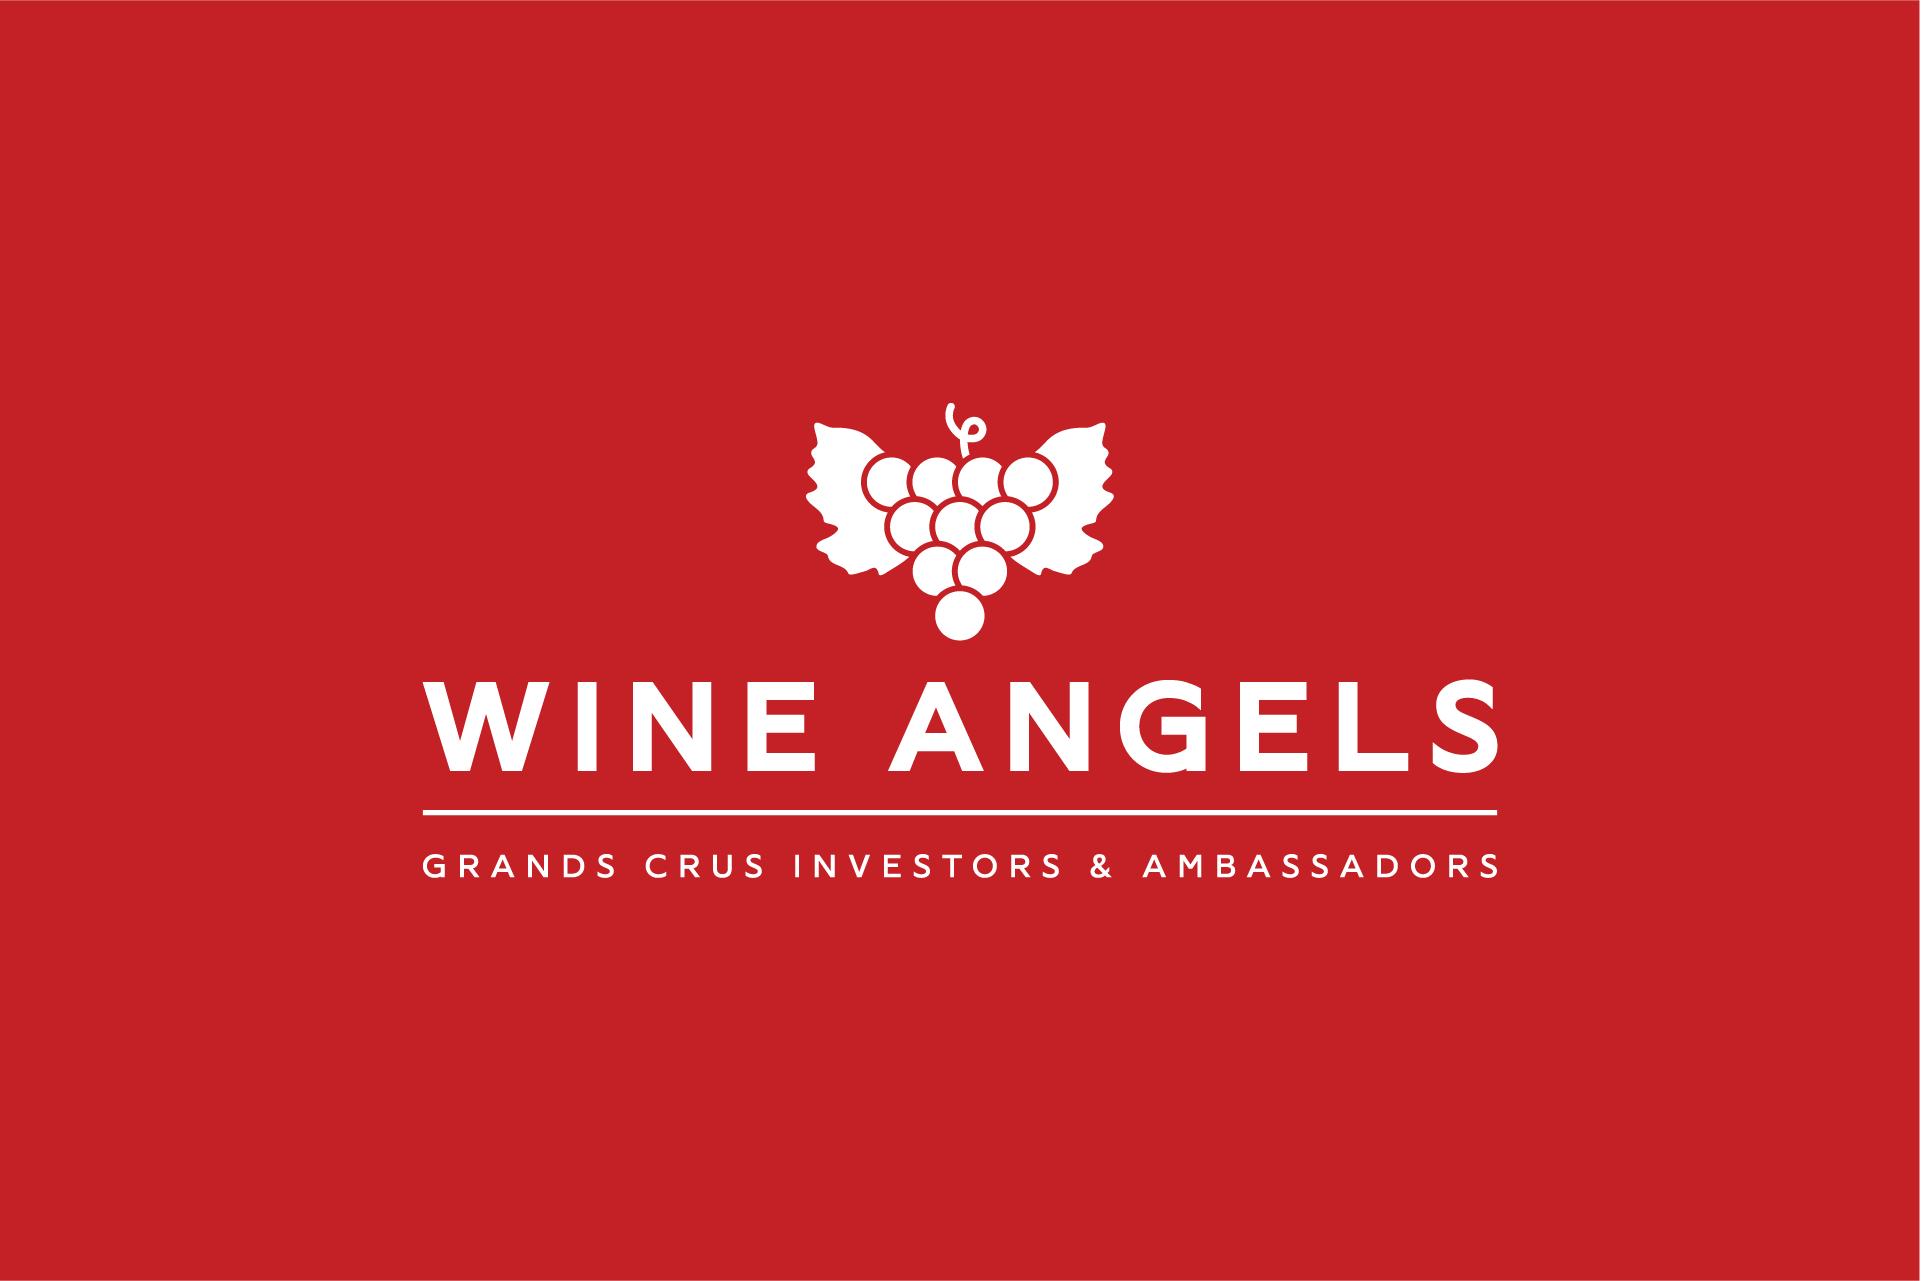 Wine Angels branding